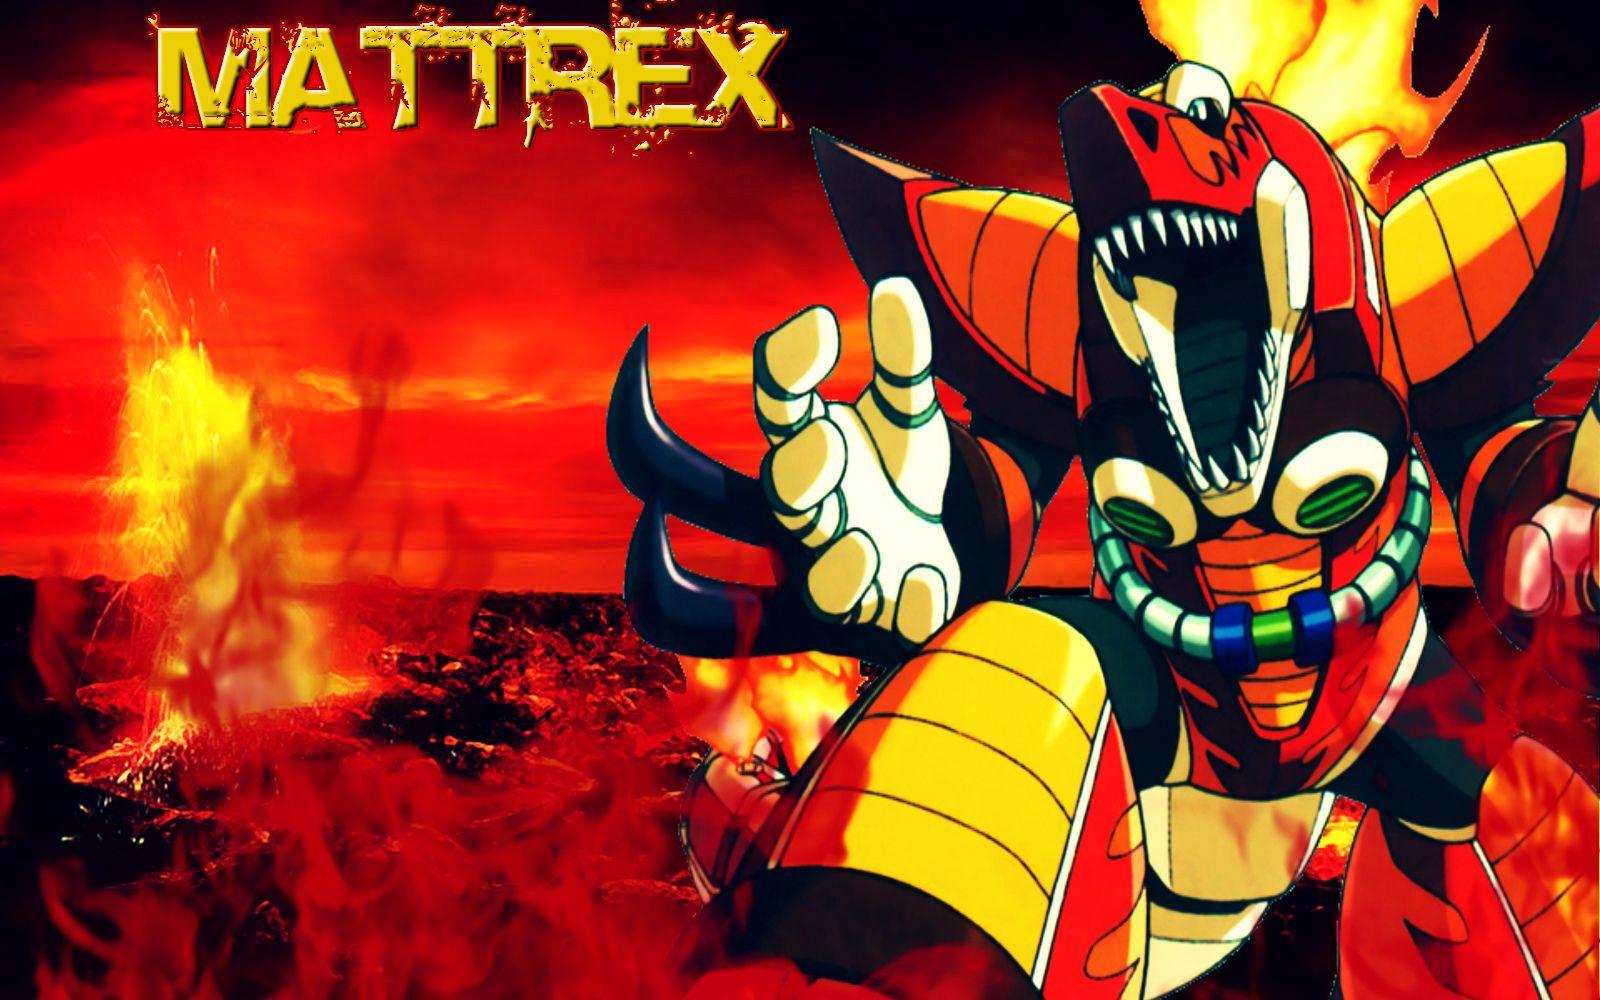 Wallpapers Panda Megaman X5 - Wallpaper Cave